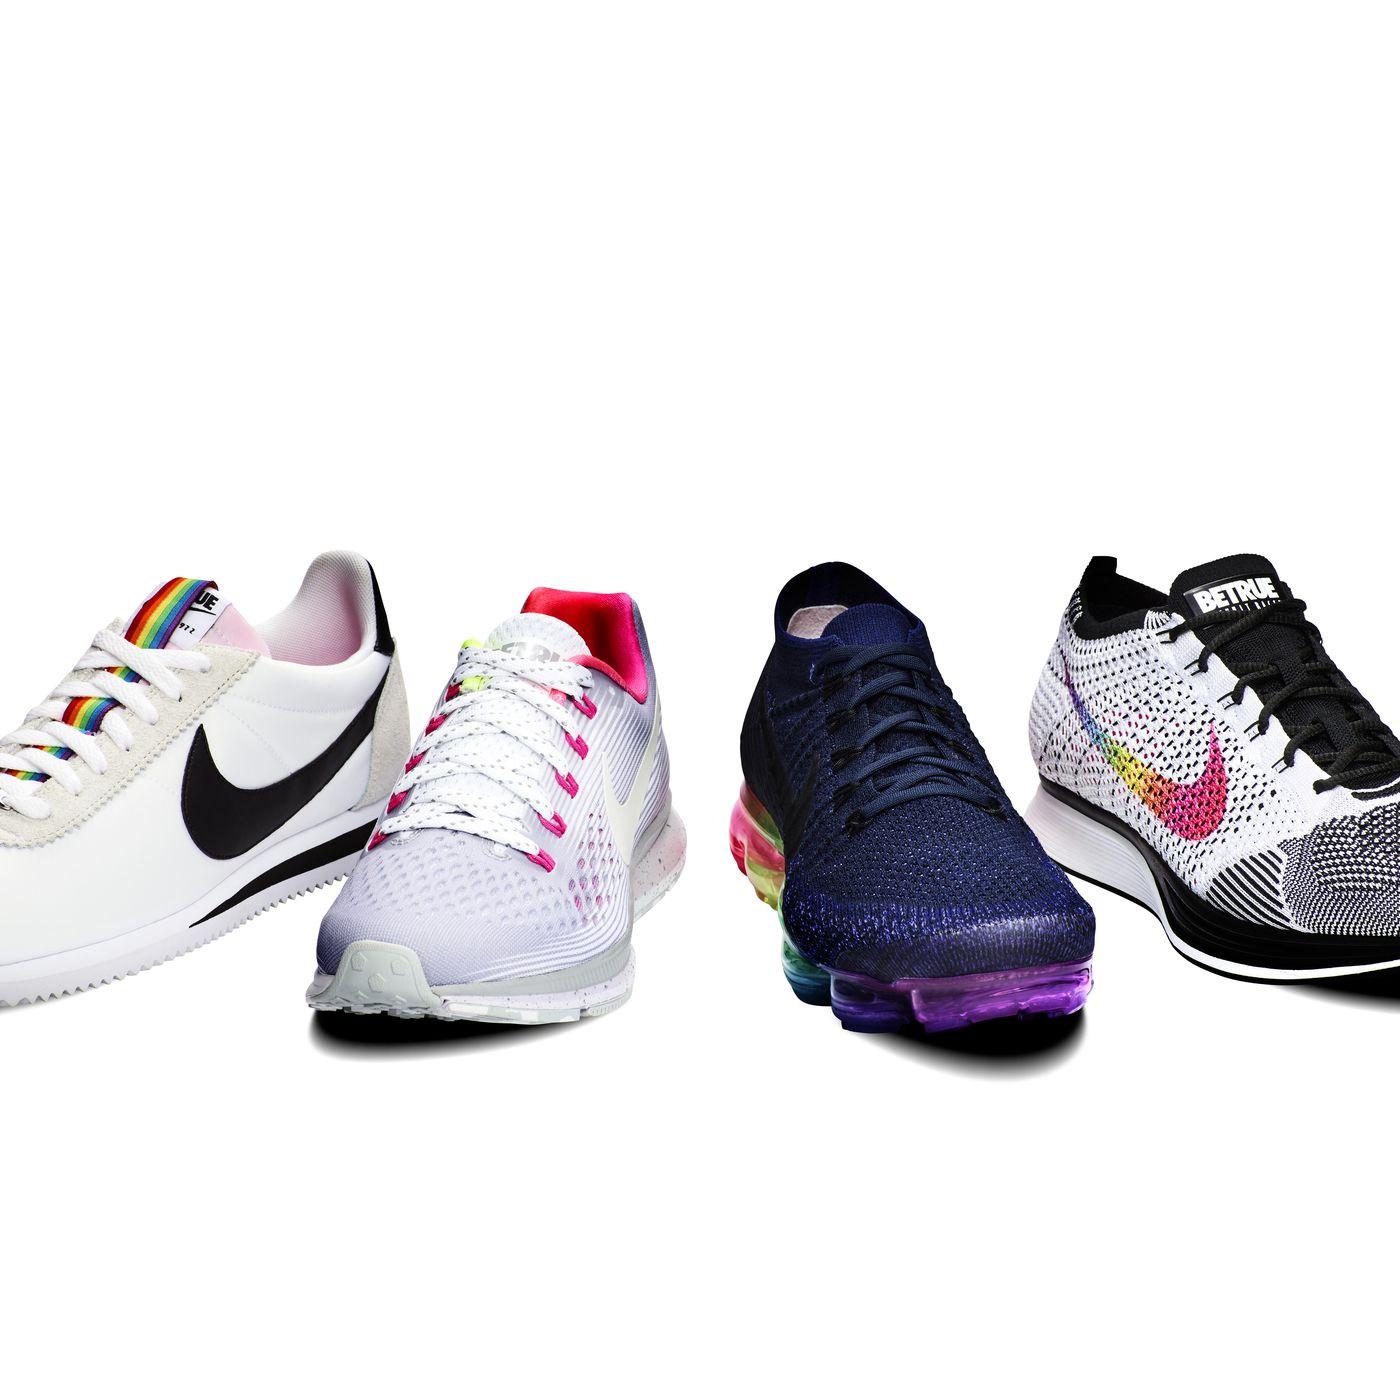 02fccba660889d Get a sneak peek at Nike s 2017 BeTrue line